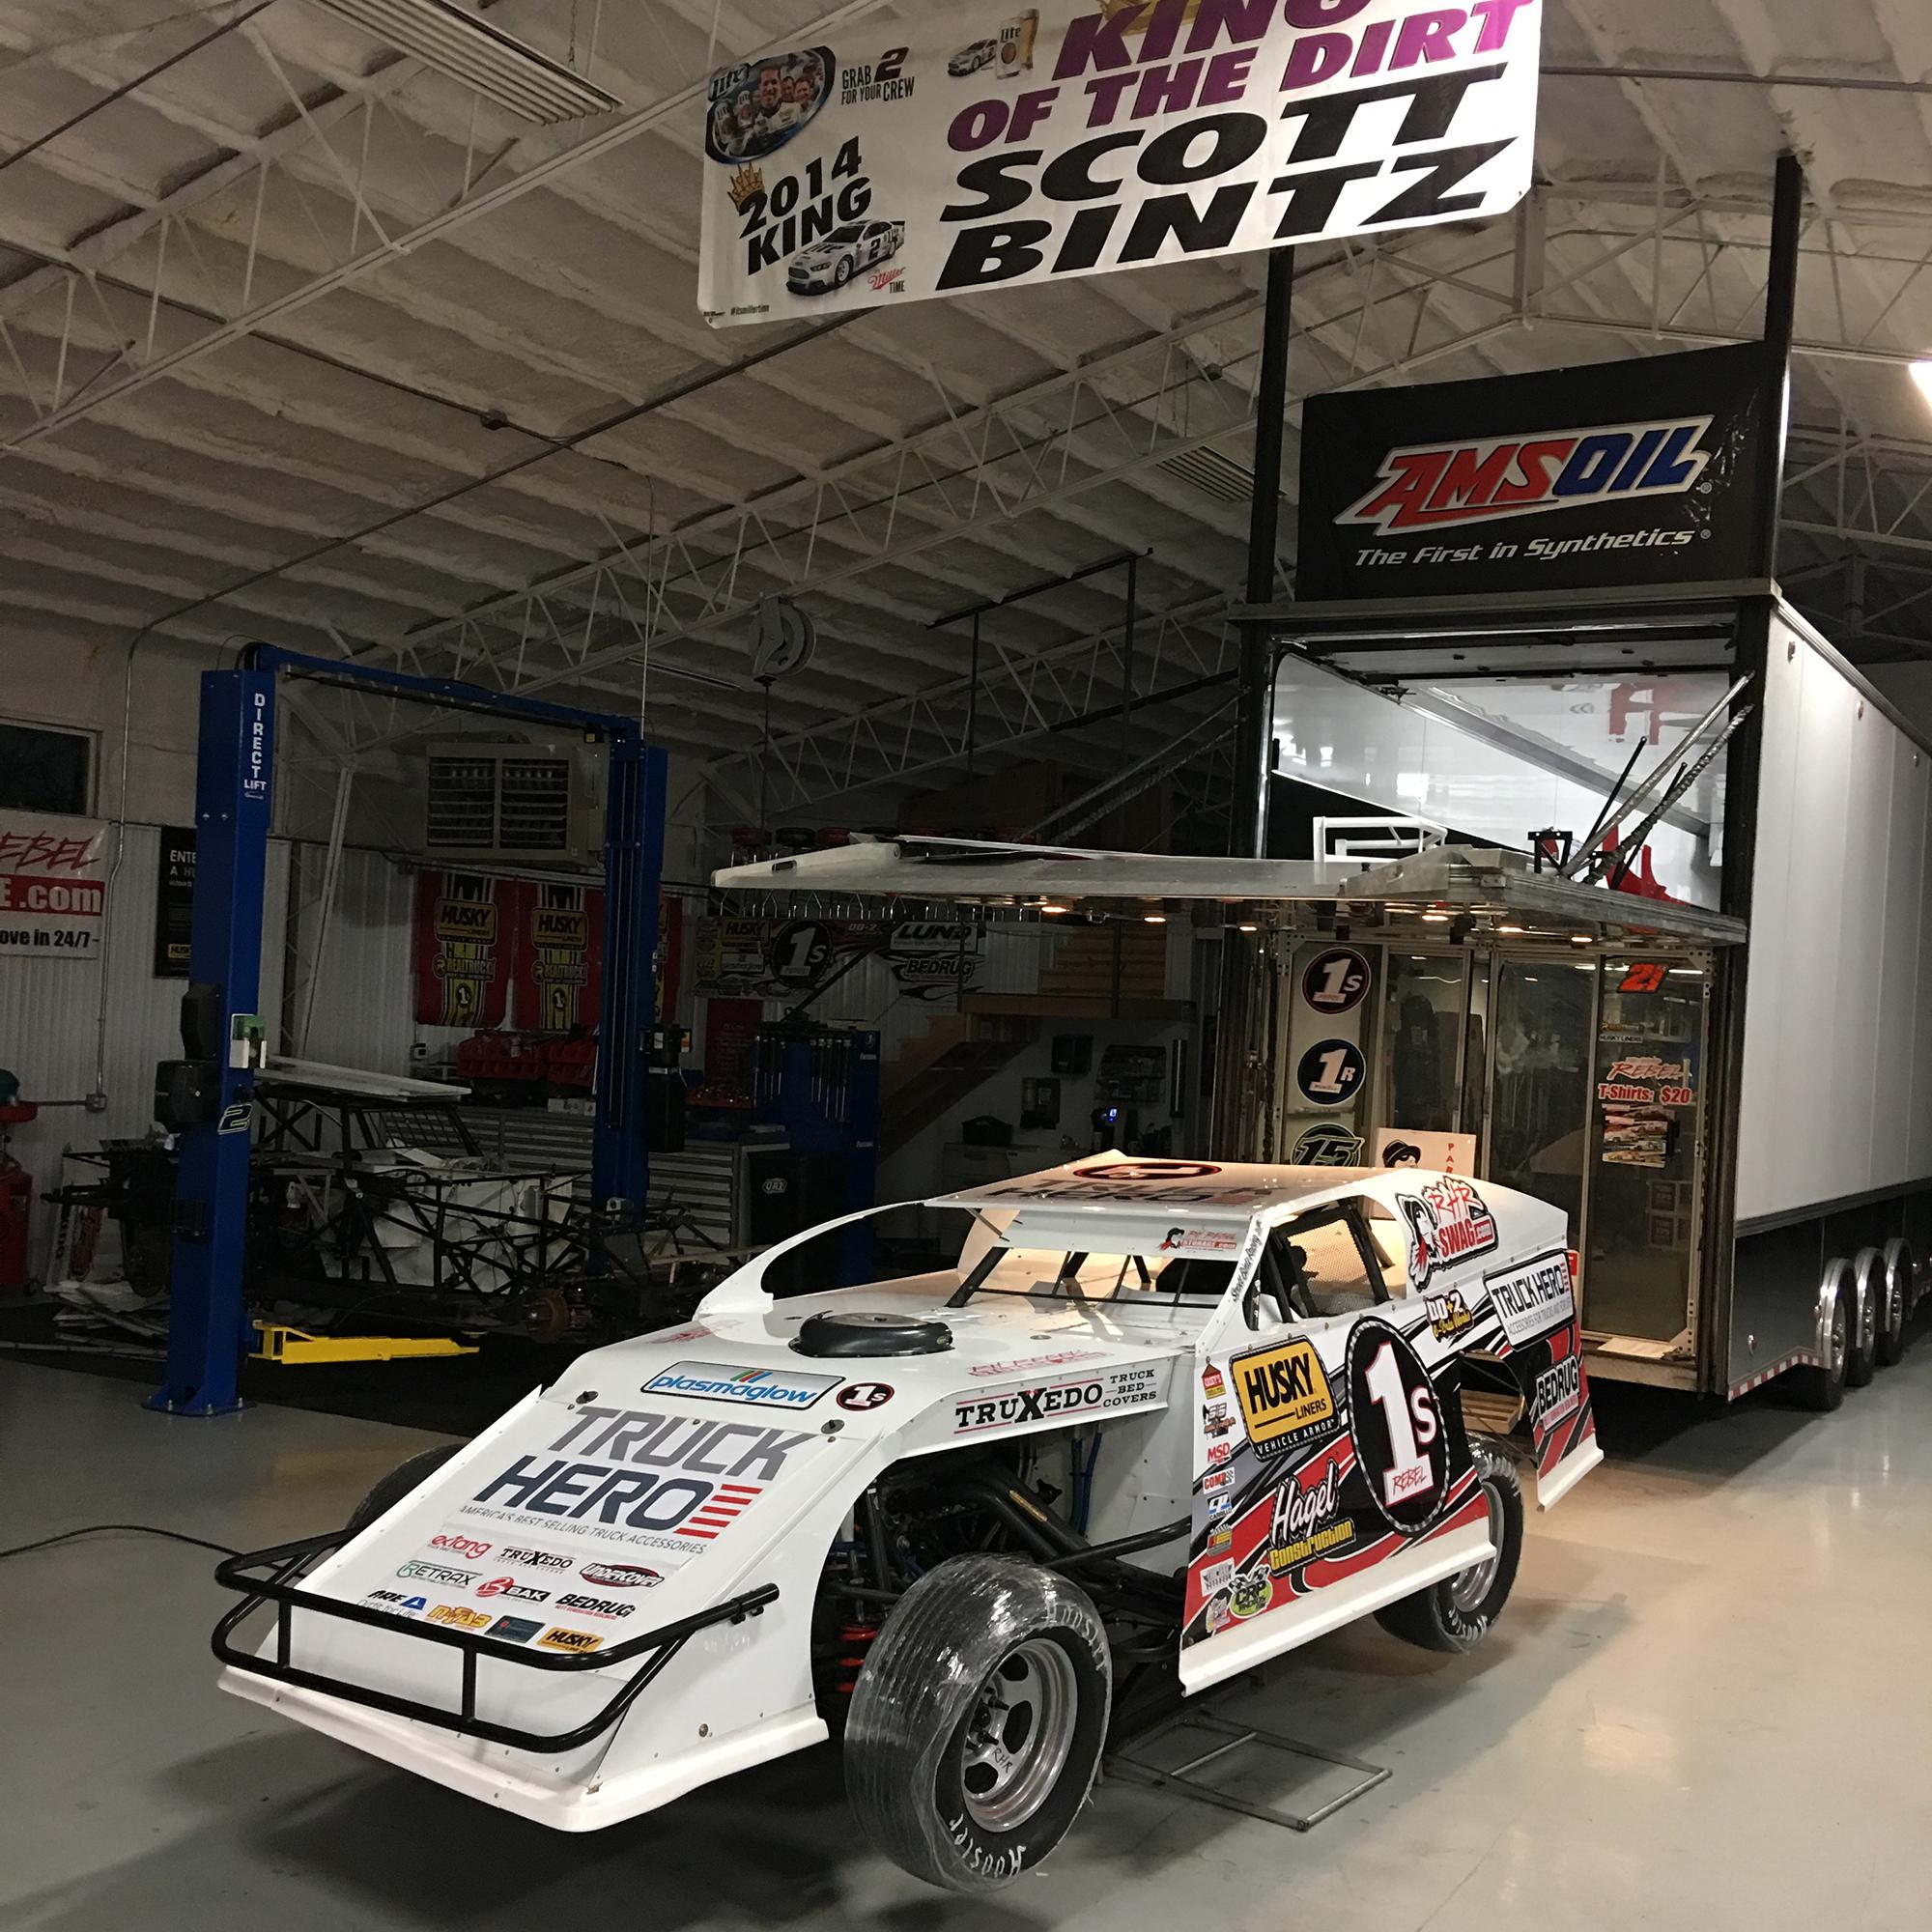 1s UMP Dirt Modified from Scott Bintz Racing